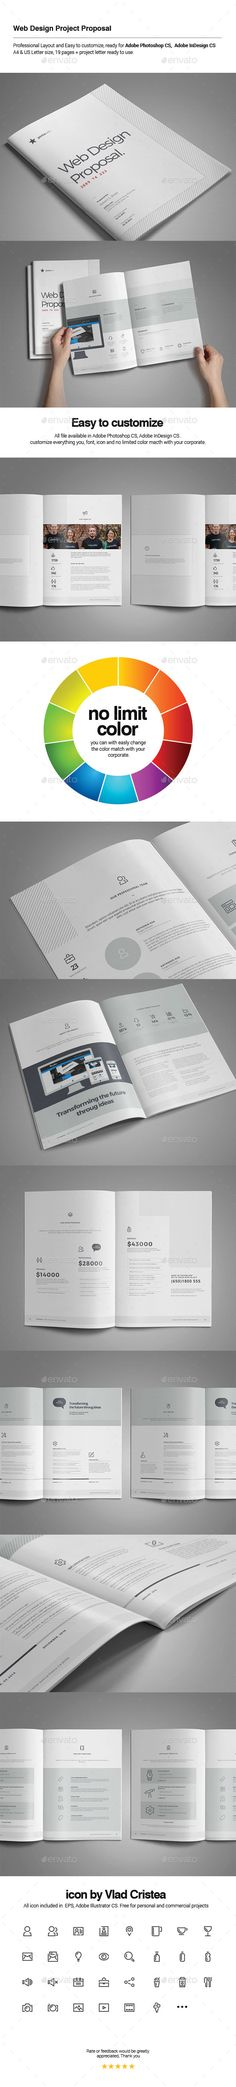 Web Design Proposal (InDesign INDD, CS4, 8.5x11, black proposal, business proposal, clean, clean proposal, cms proposal, green proposal, purple proposal, seo, theme, themeforest, web design, web development, website proposal, wordpress, yellow proposal)